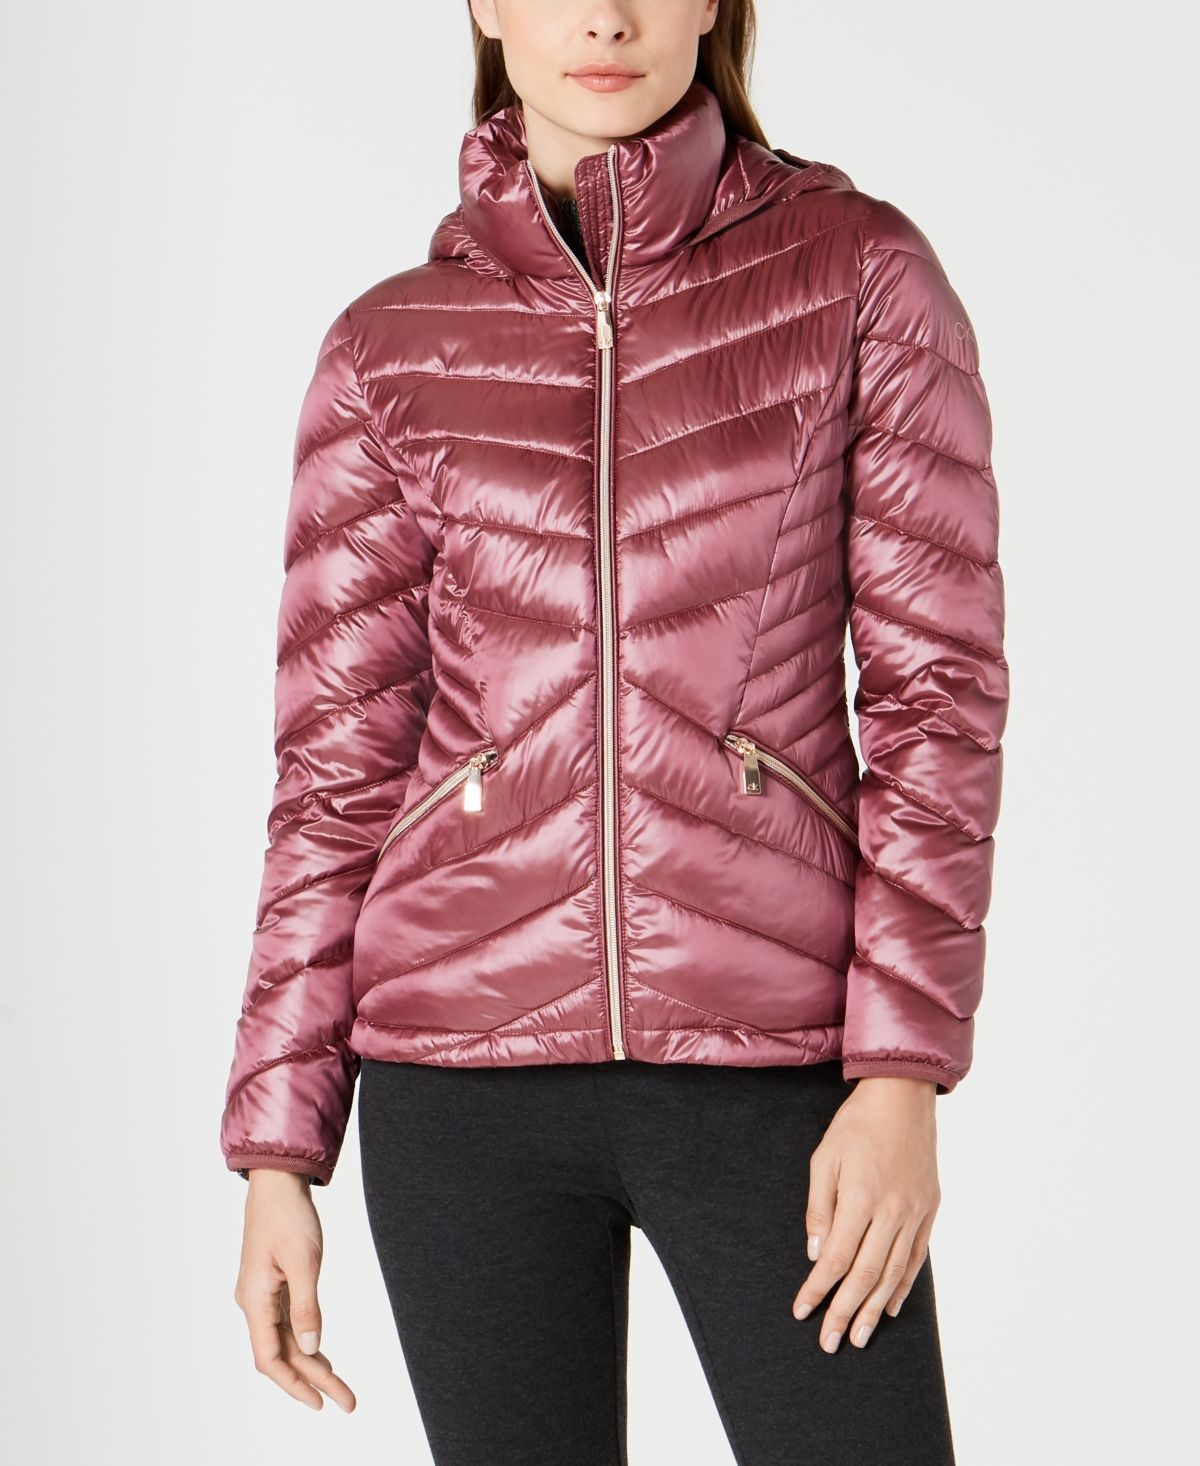 Calvin Klein Chevron Packable Down Puffer Coat Created For Macy S Reviews Coats Women Macy S Down Puffer Coat Puffer Coat Calvin Klein Jeans Women [ 1466 x 1200 Pixel ]